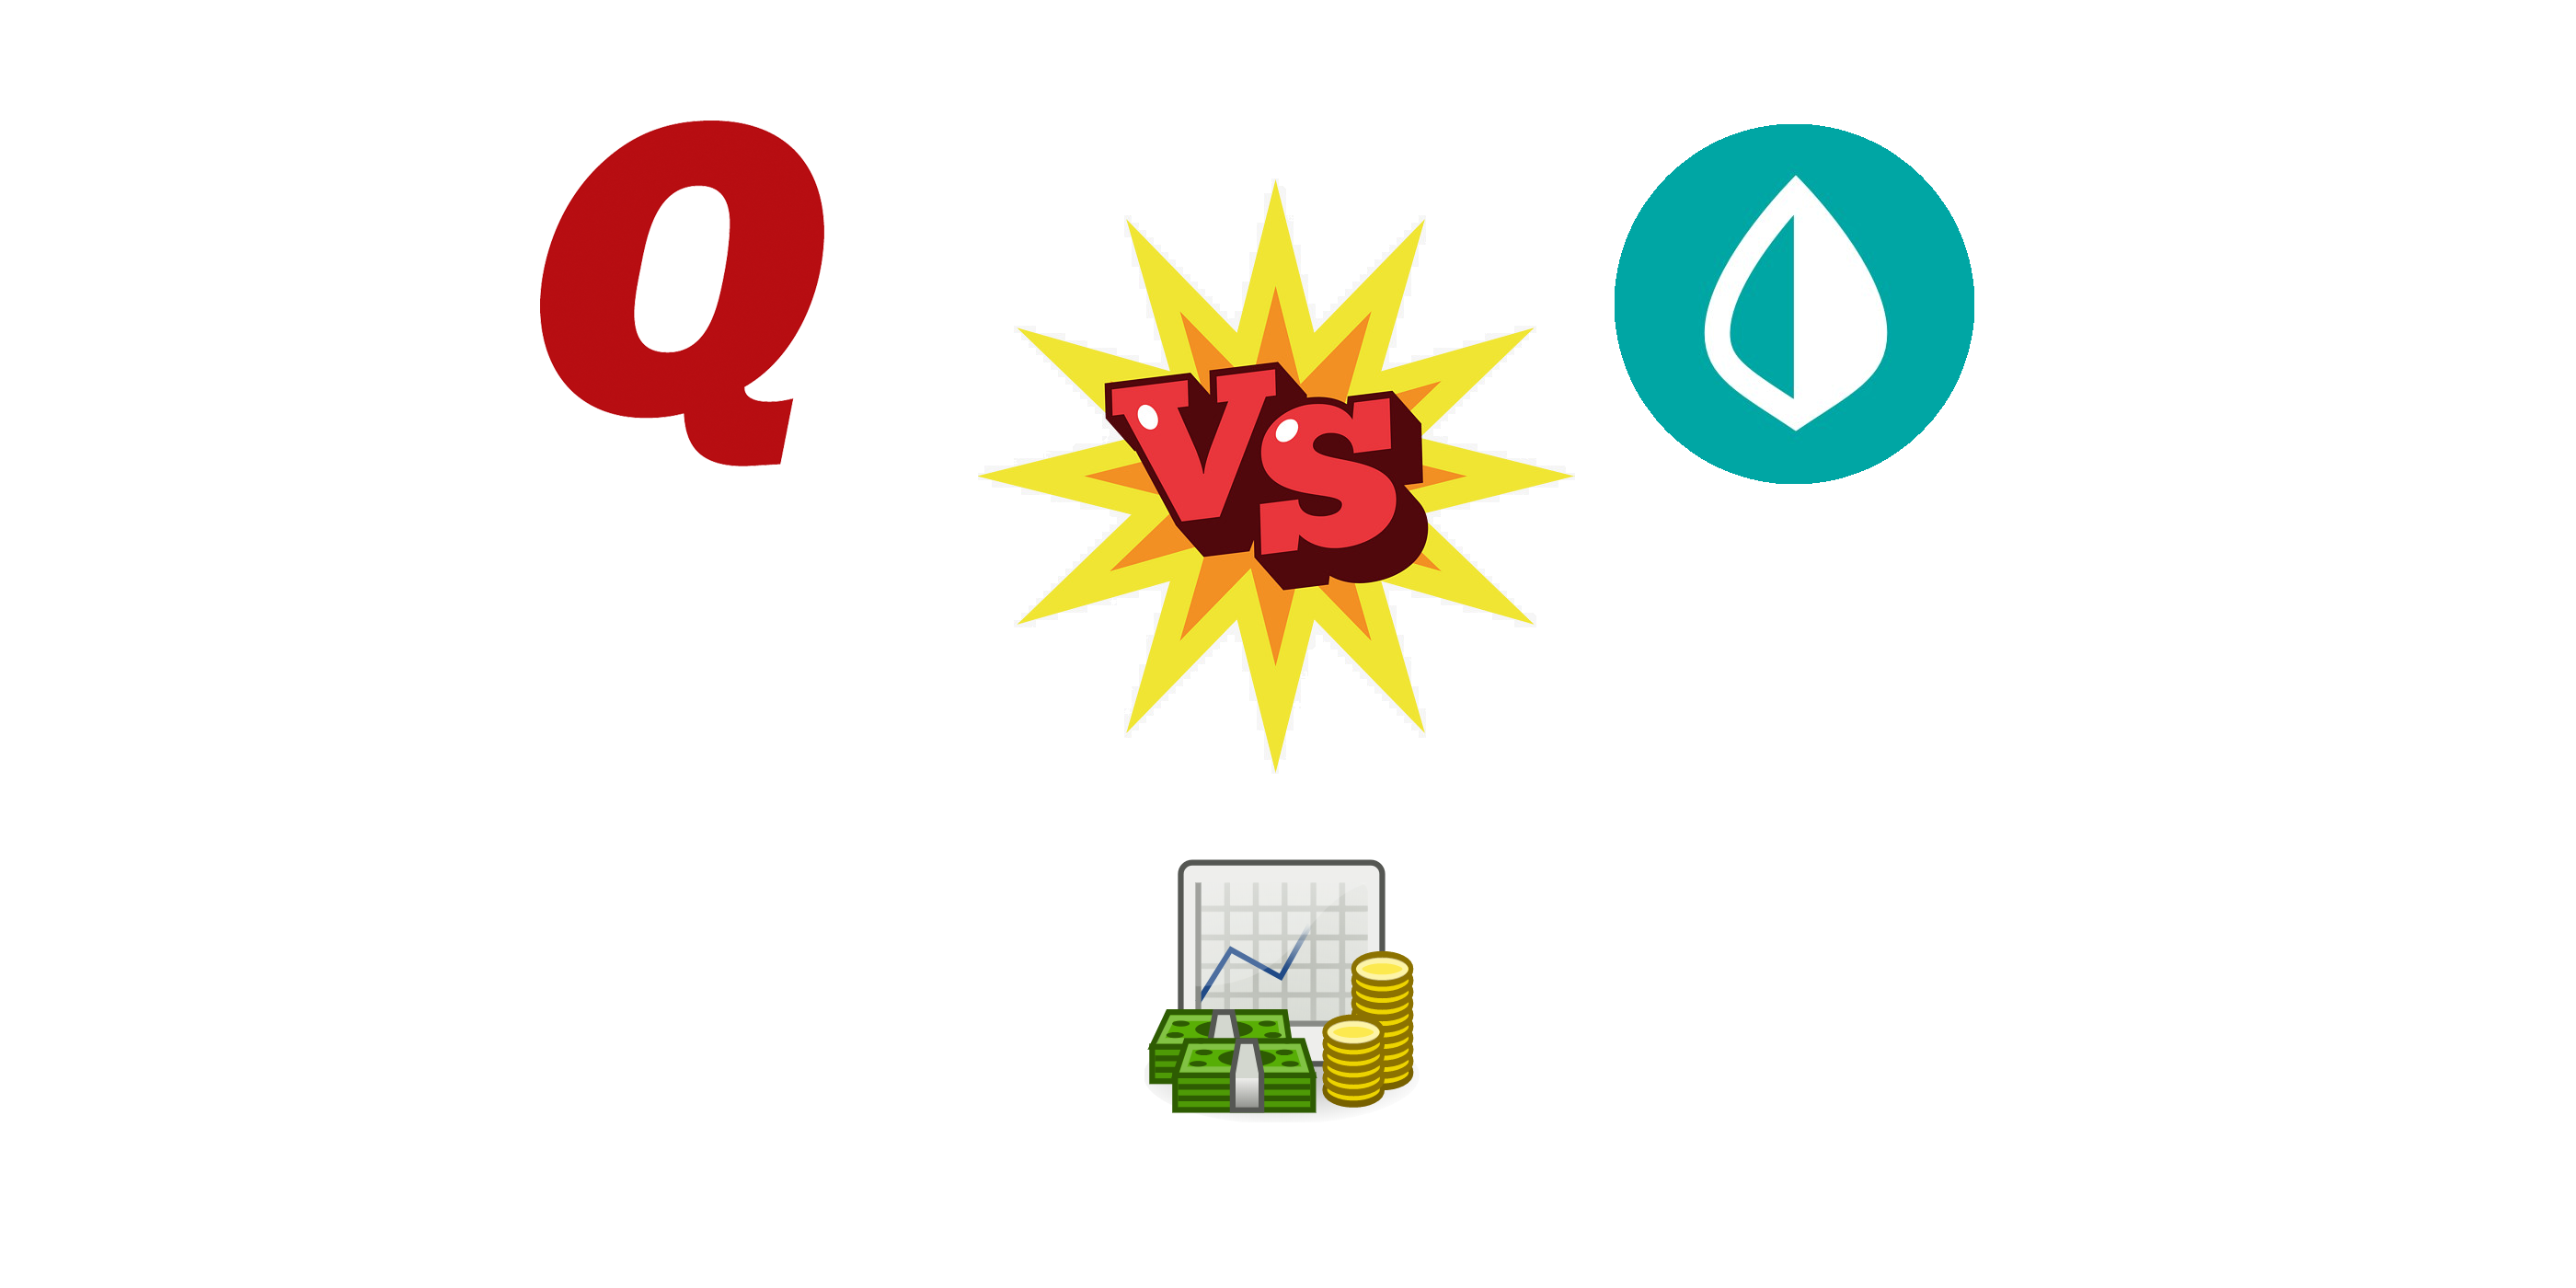 Quicken vs. Mint vs. GnuCash